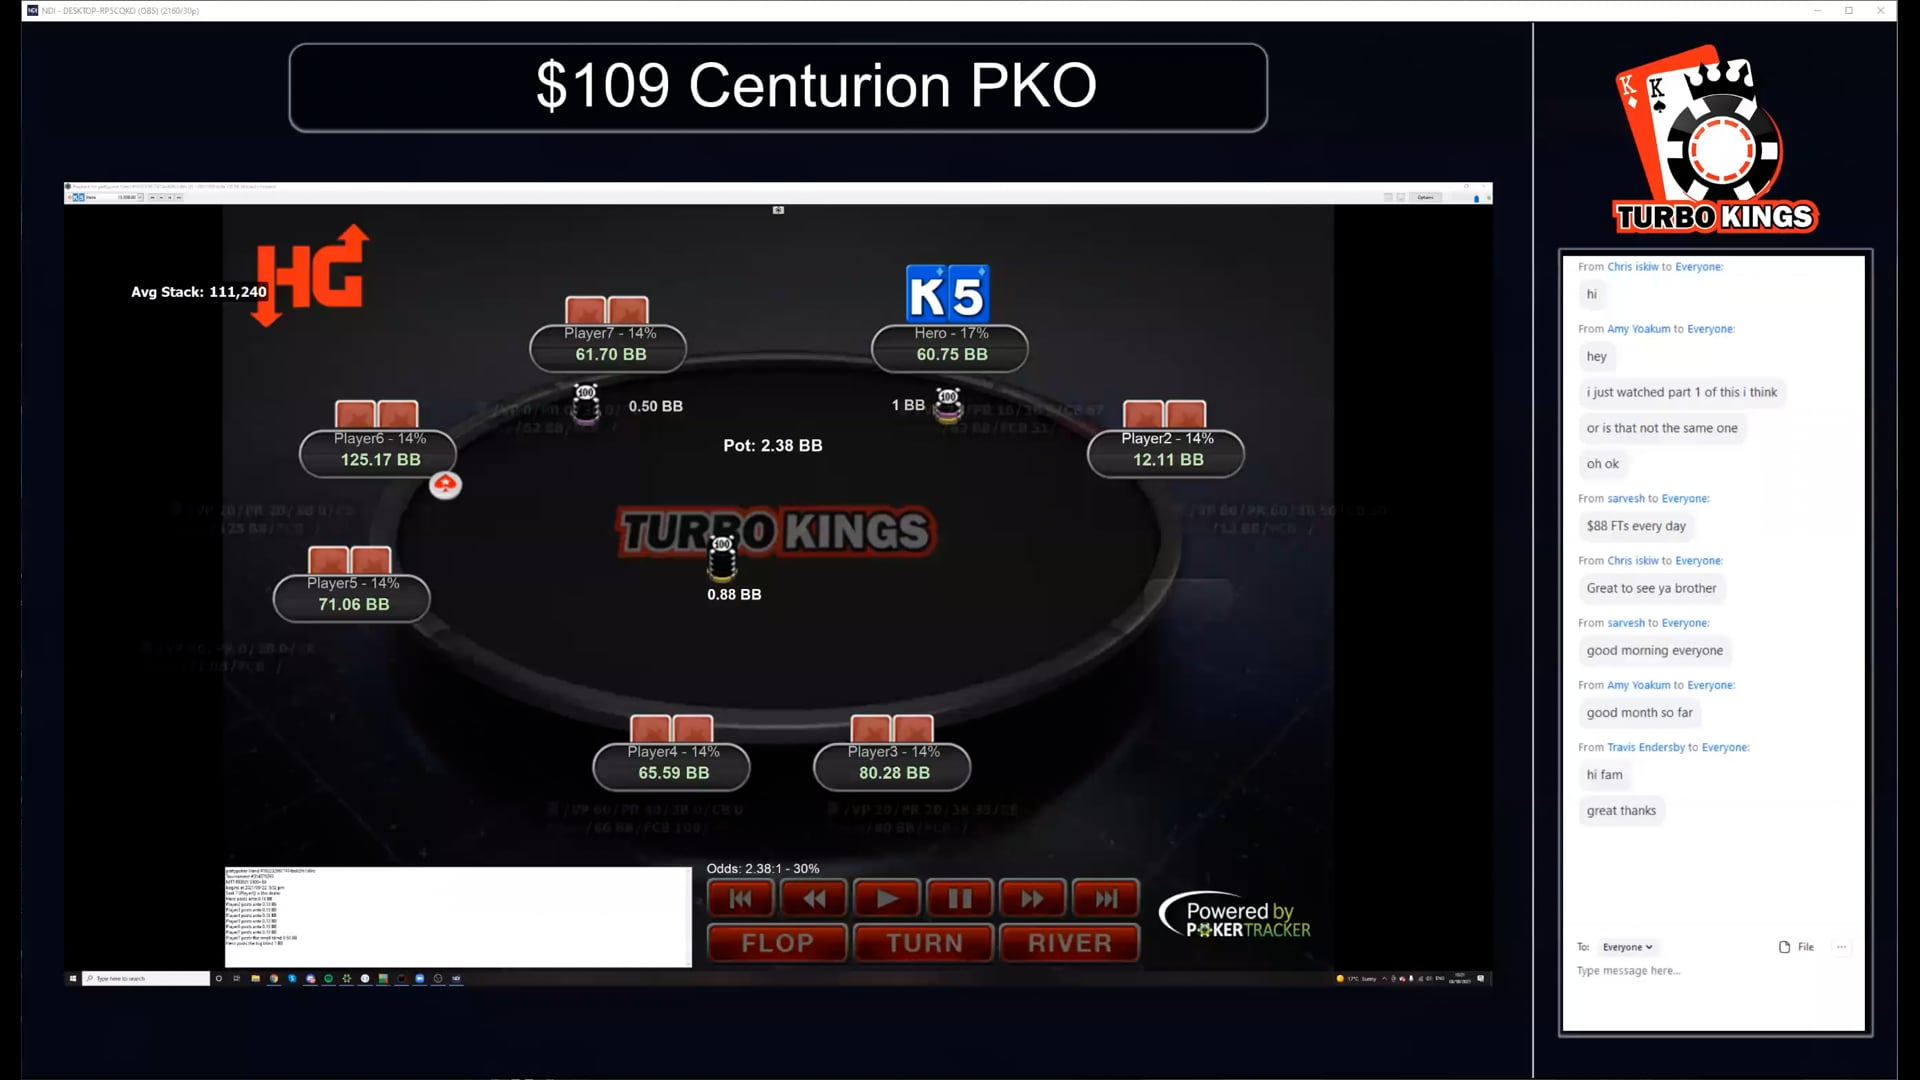 2021_10_06 - Brad - 109$ Centurion PKO part 1